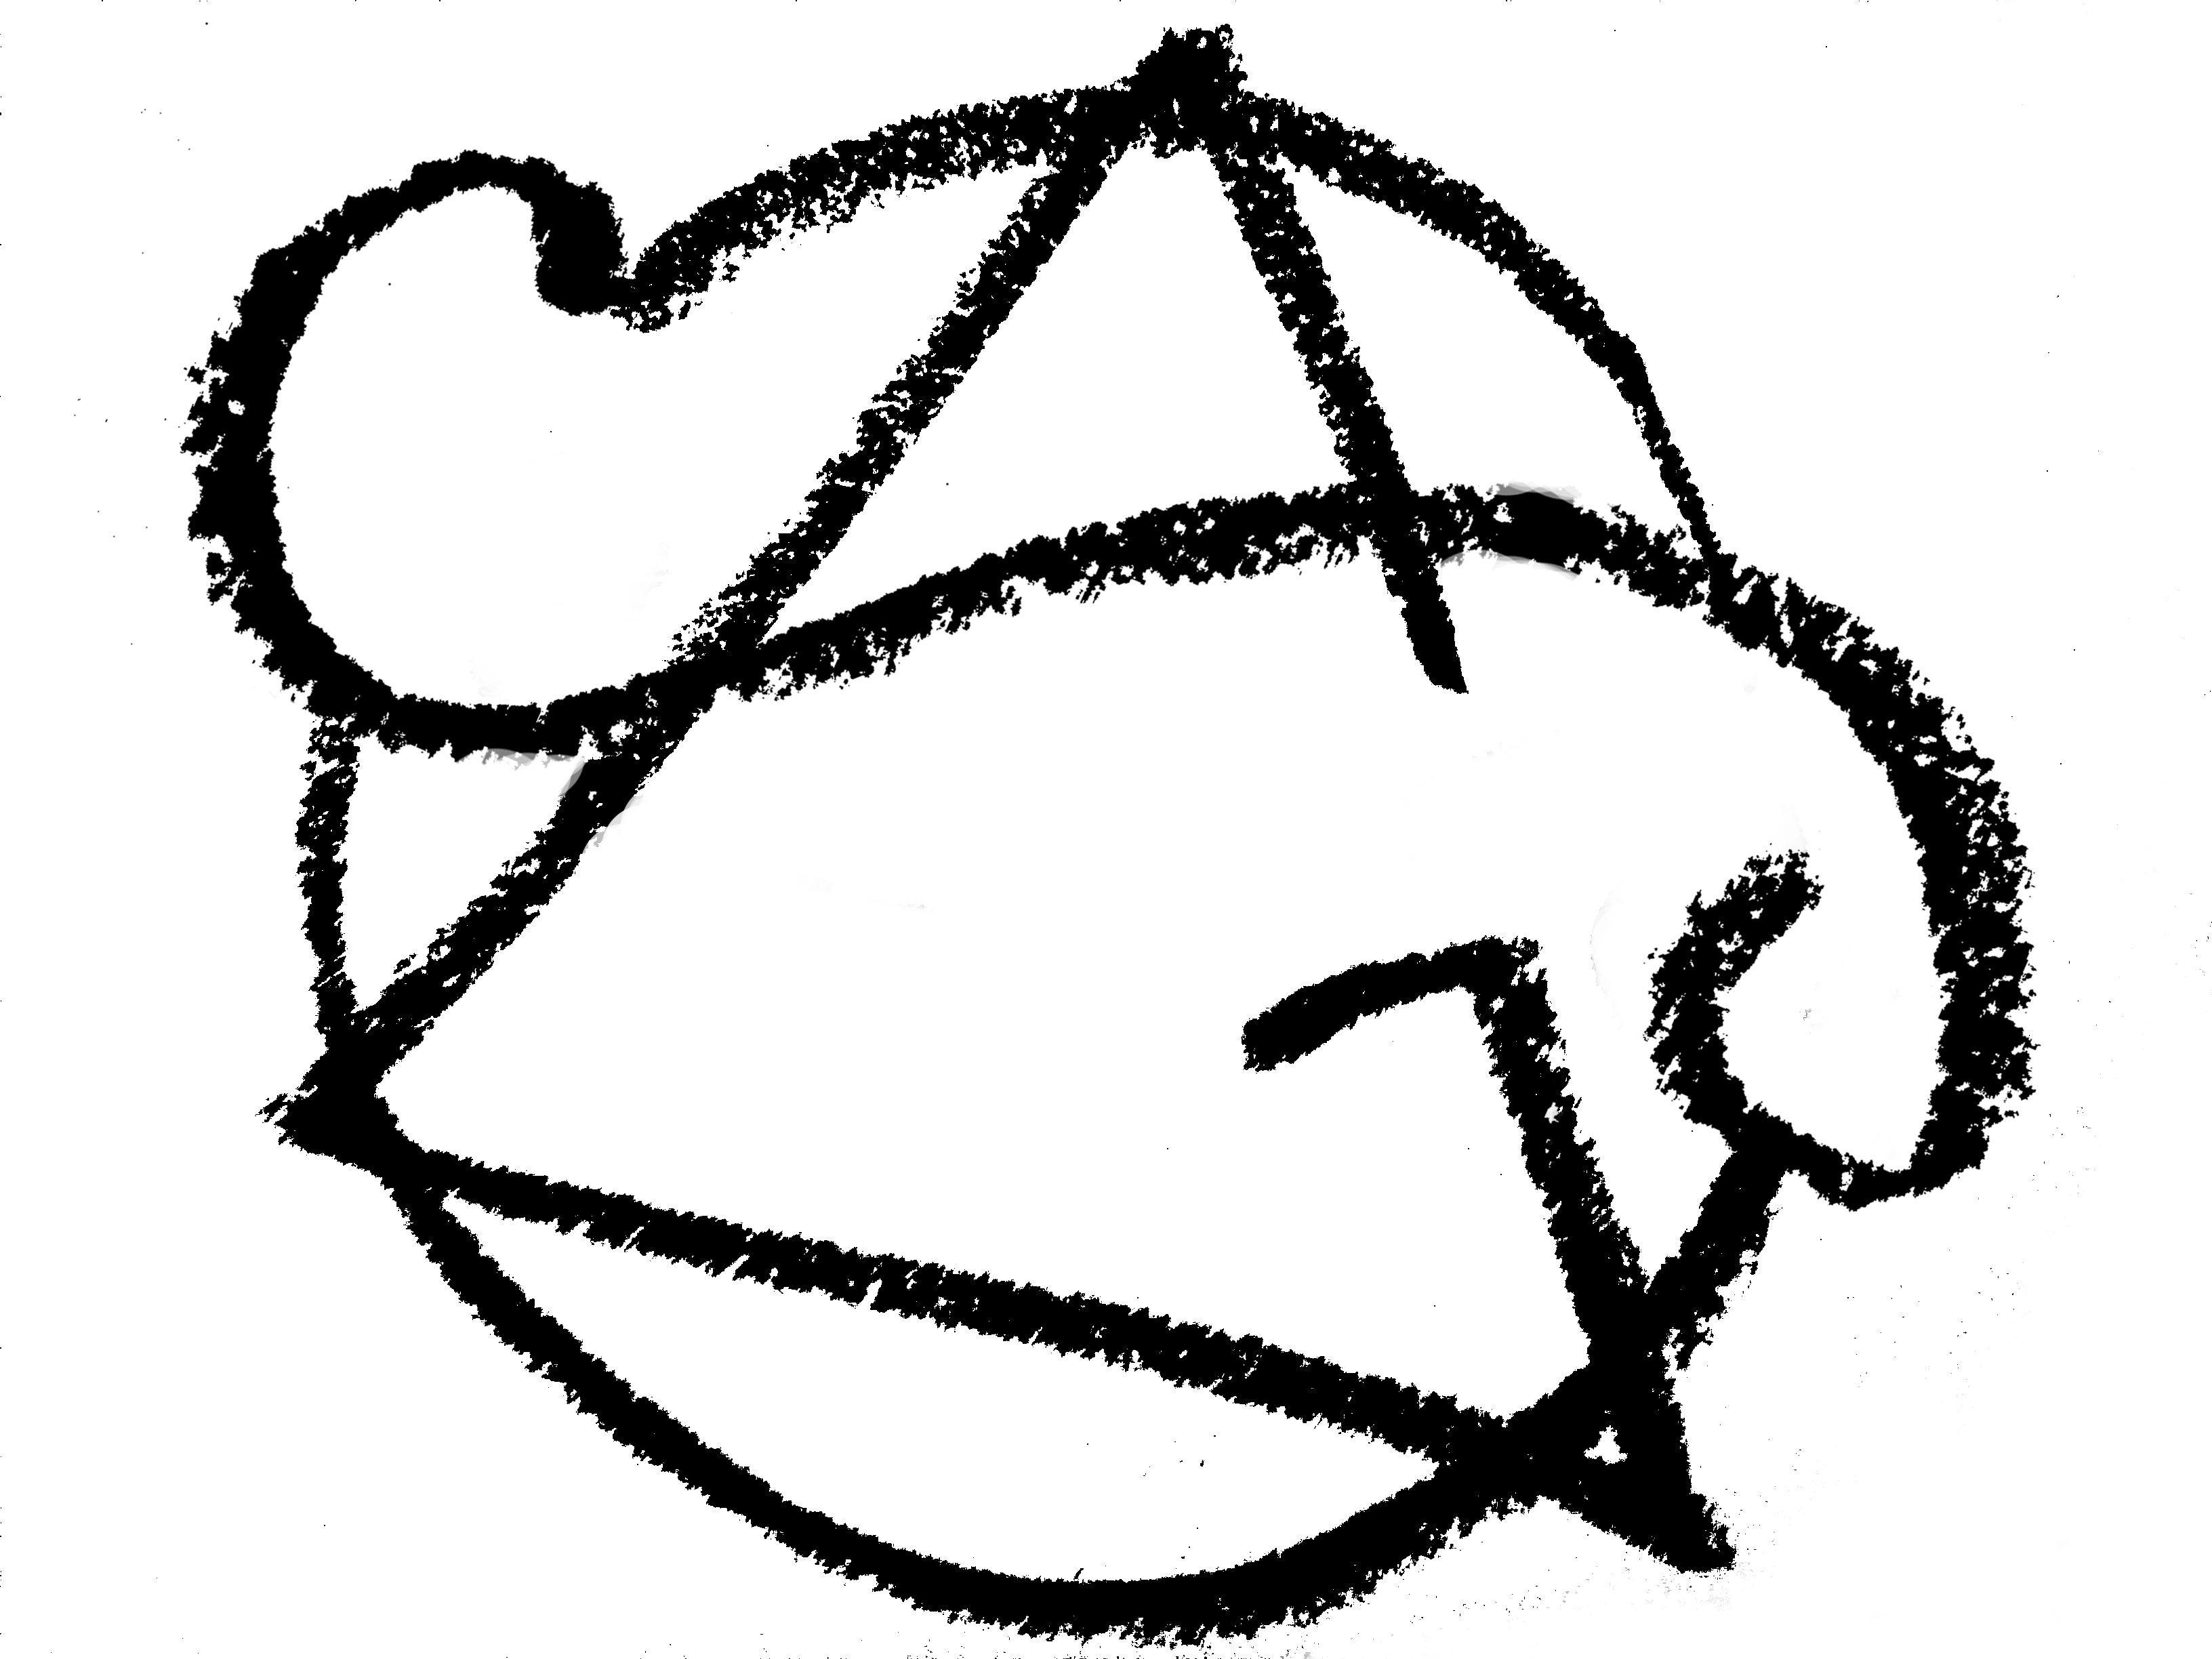 The serenity prayer tattoos pinterest prayer tattoo lotus todays sigil gives a nod to both century christianity and modern programs the sereni dhlflorist Choice Image